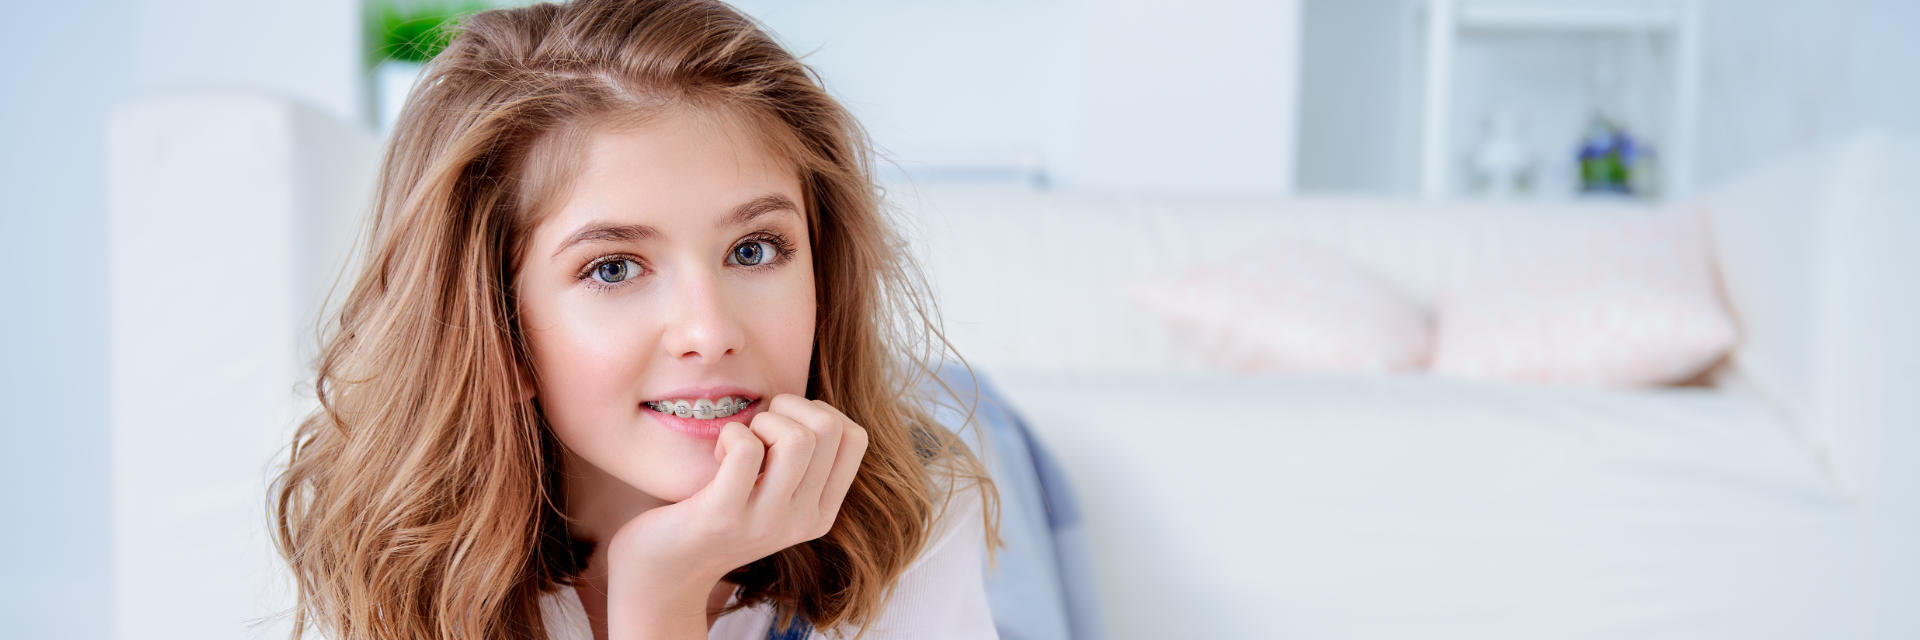 A teenage girl wearing orthodontic braces.